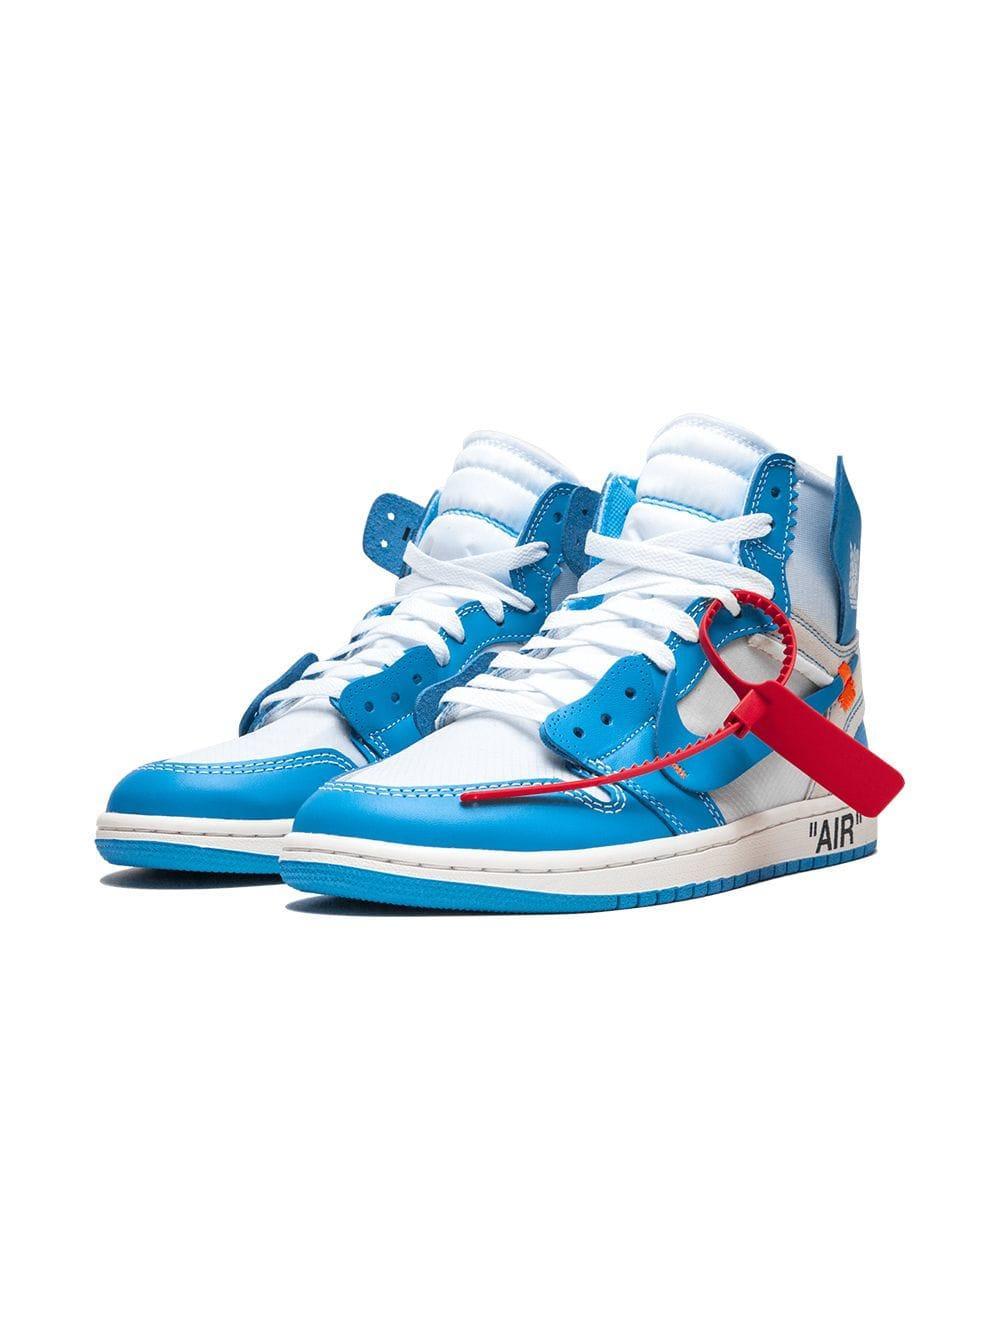 194869887b5f Nike X Off-white Air Jordan 1 Sneakers in Blue - Save 40% - Lyst